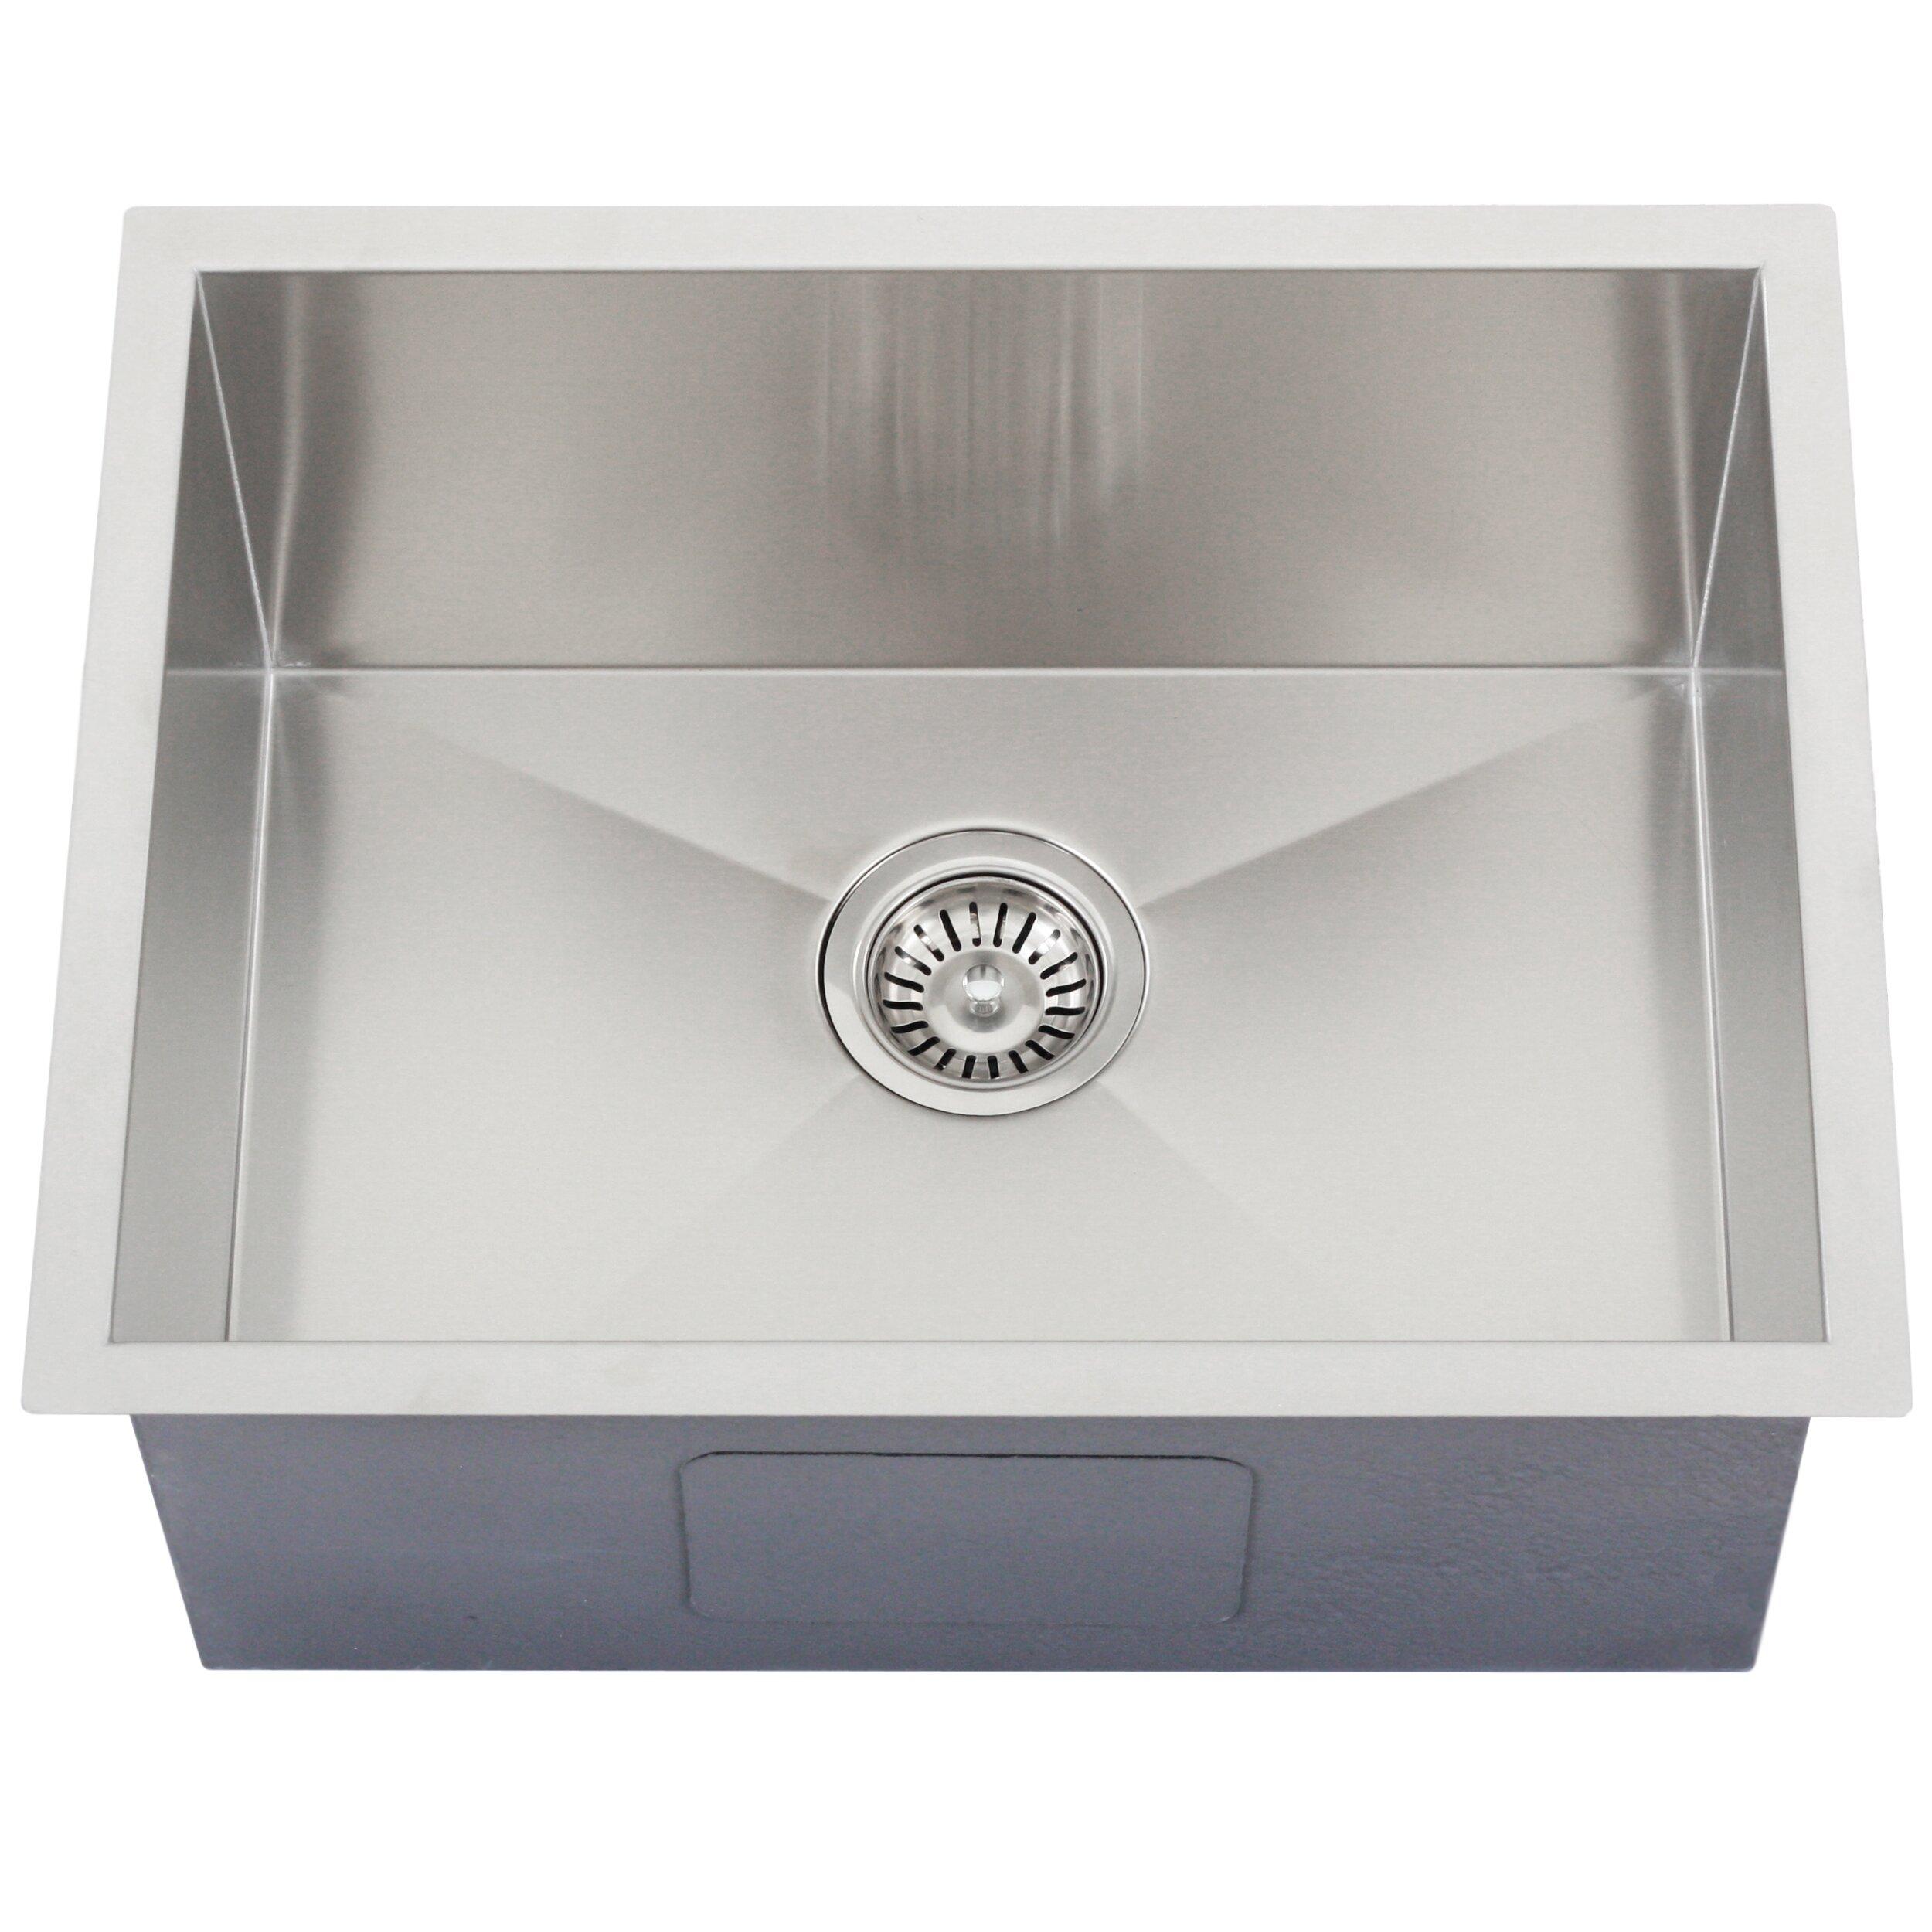 Ticor sinks ticor 22 1 2 x 17 1 2 inch zero radius 16 - Square stainless steel bathroom sink ...